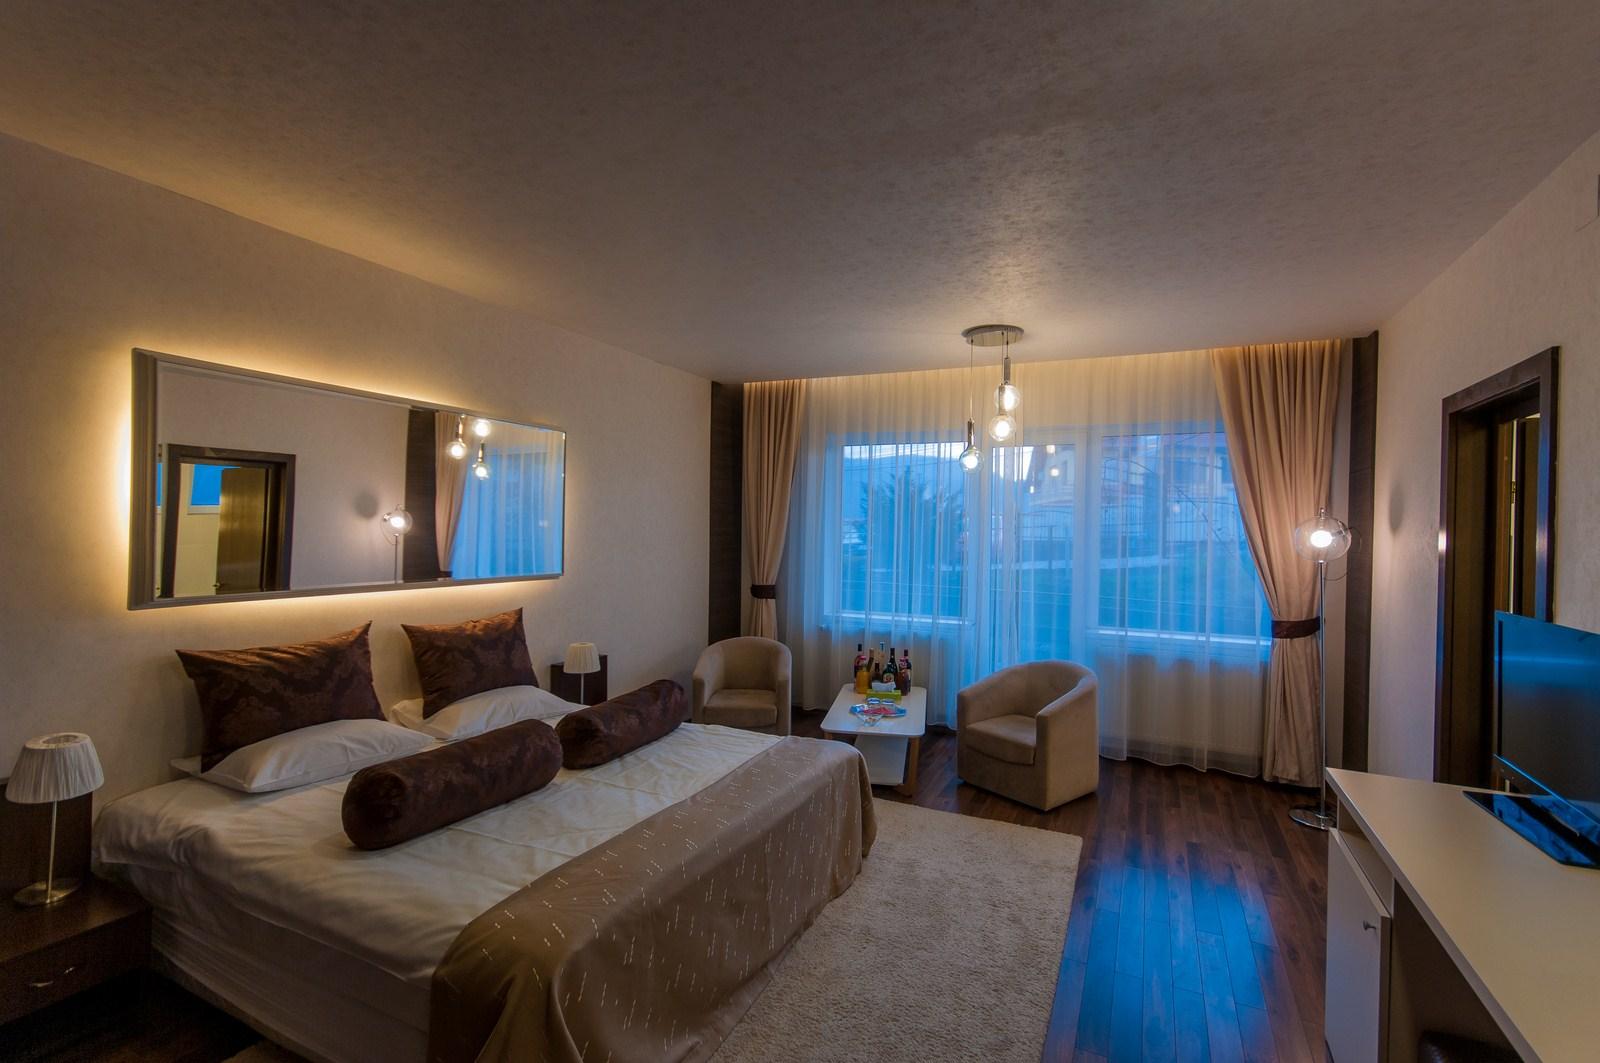 Corpuri de iluminat pentru camera de hotel - Idromassaggio in camera da letto ...